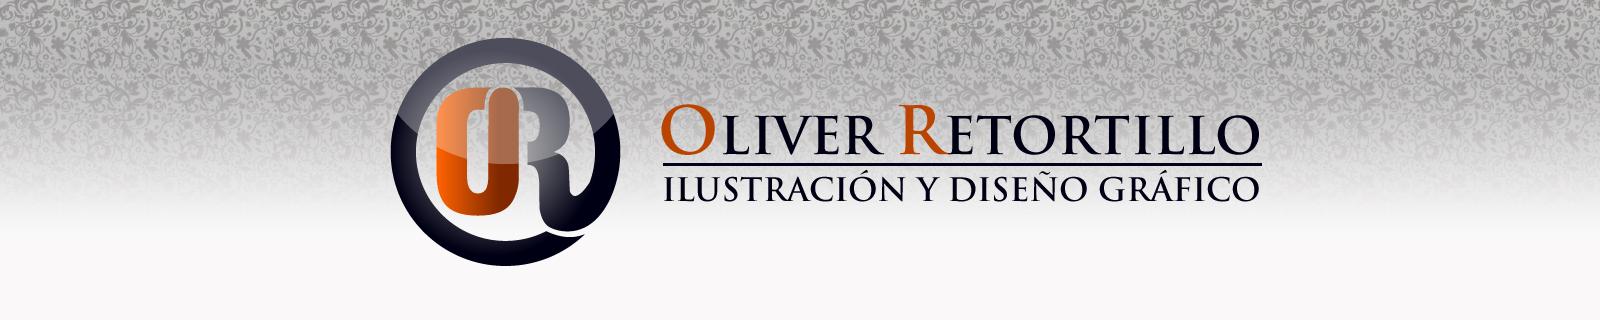 Oliver Retortillo